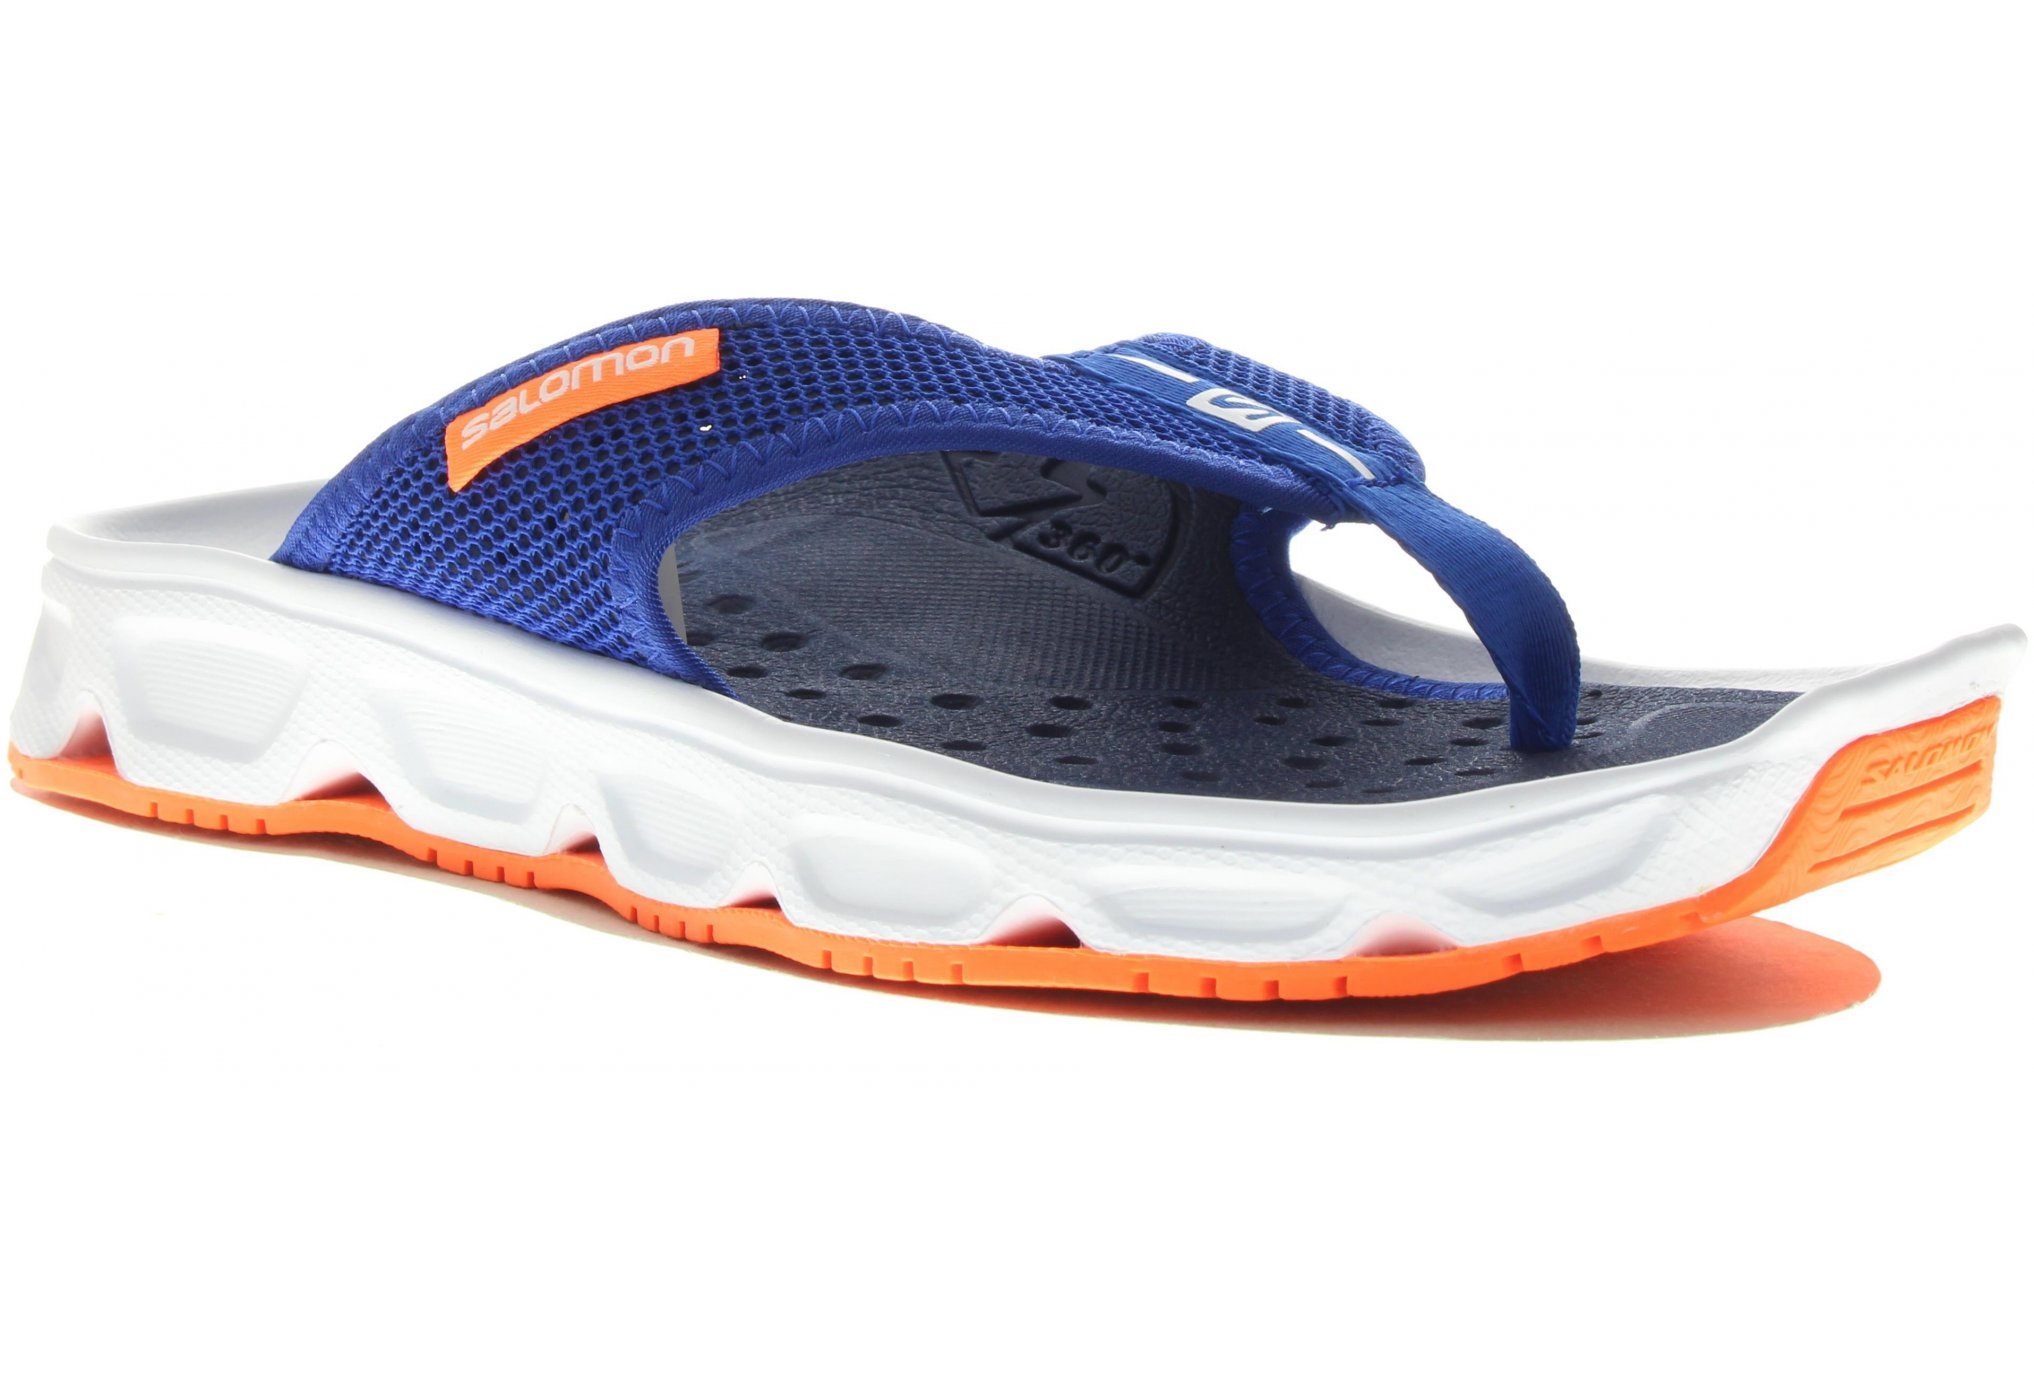 Salomon rx break m chaussures homme